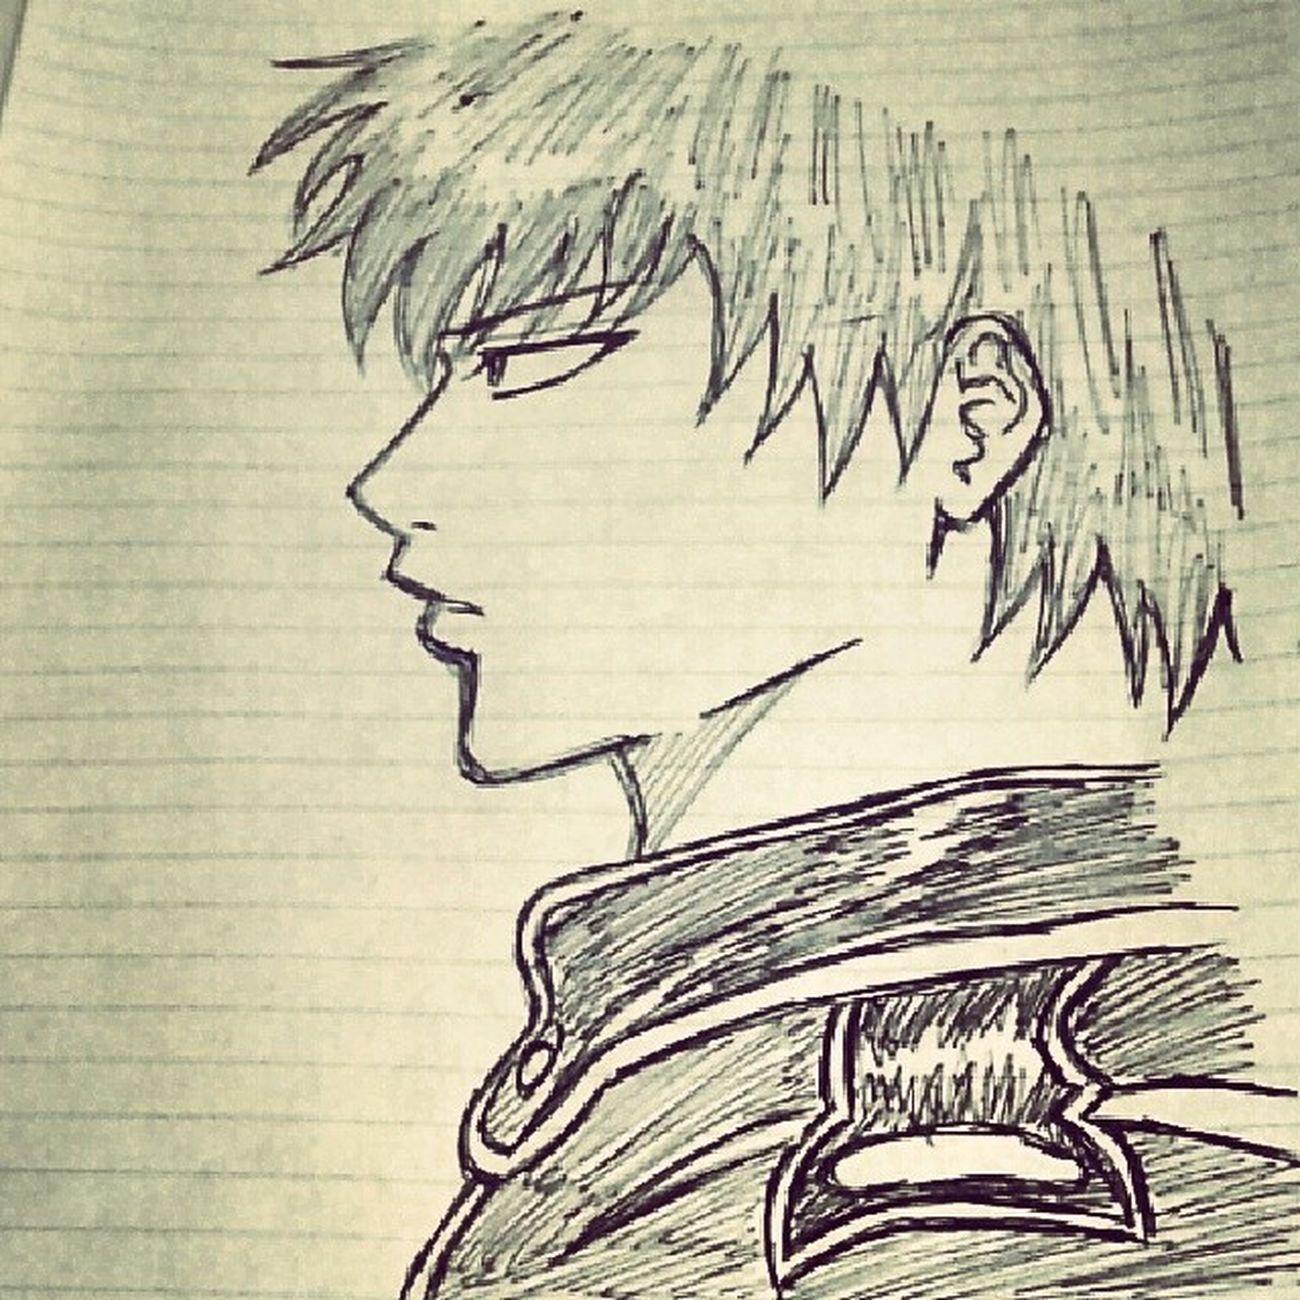 Anime Comic Gintama Hijikata Illust 漫画 銀魂 土方 絵